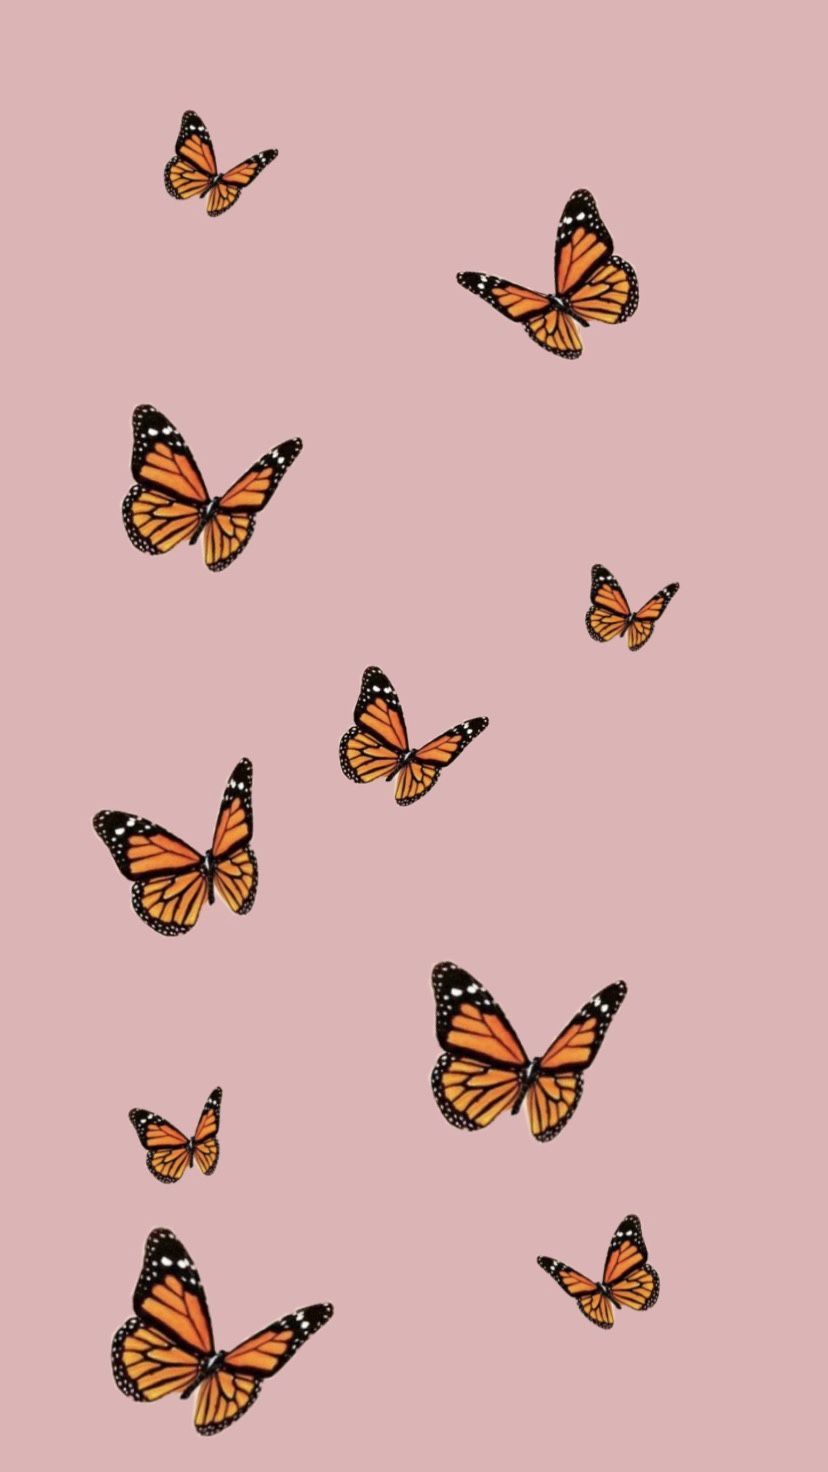 Butterfly Wallpaper Lockscreenwallpaper In 2020 Iphone Background Wallpaper Butterfly Wallpaper Aesthetic Iphone Wallpaper